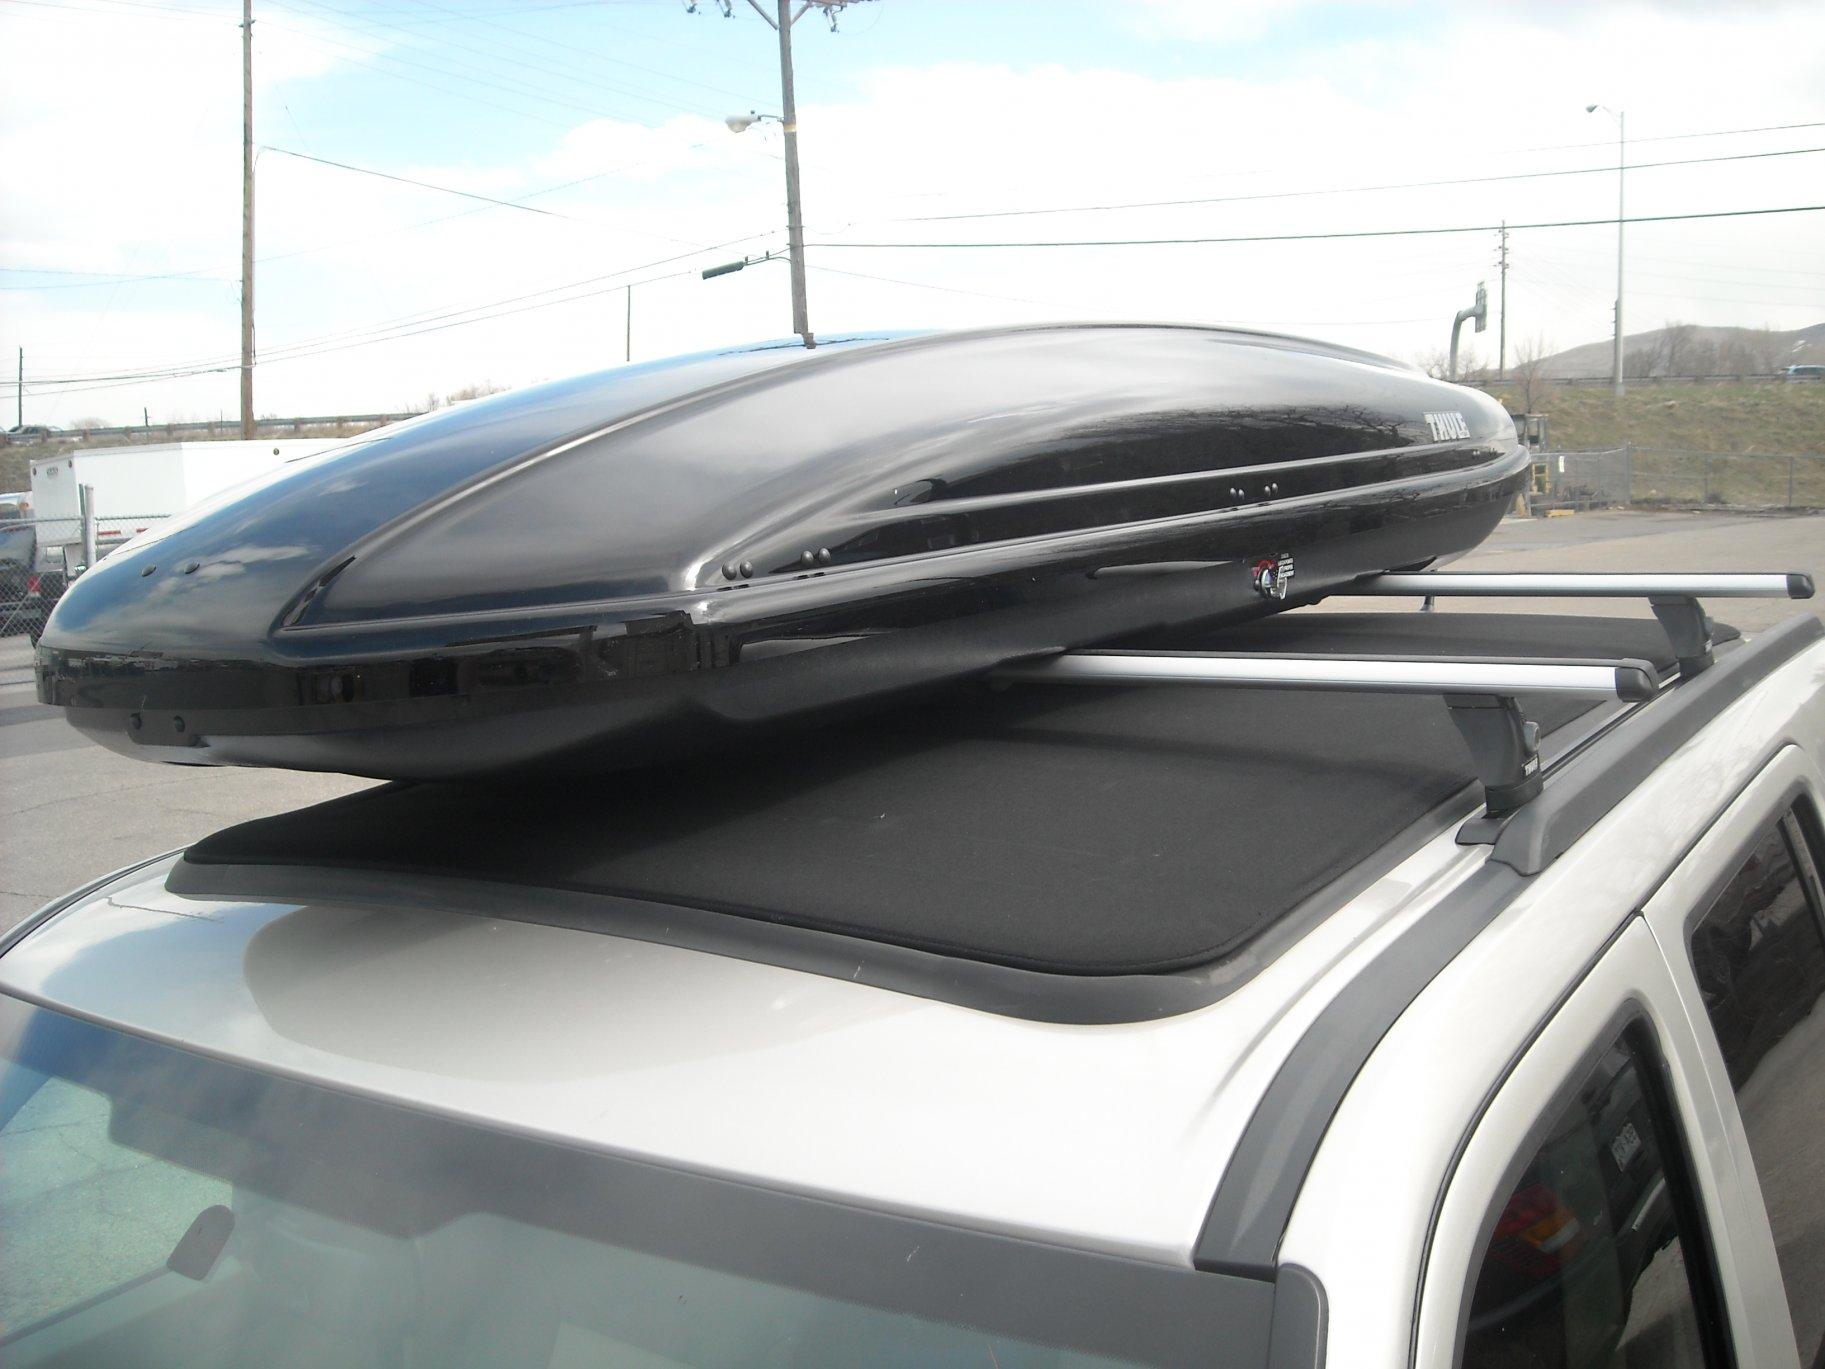 jeep-liberty-sky-slider-roof-trks-spirit-002.jpg